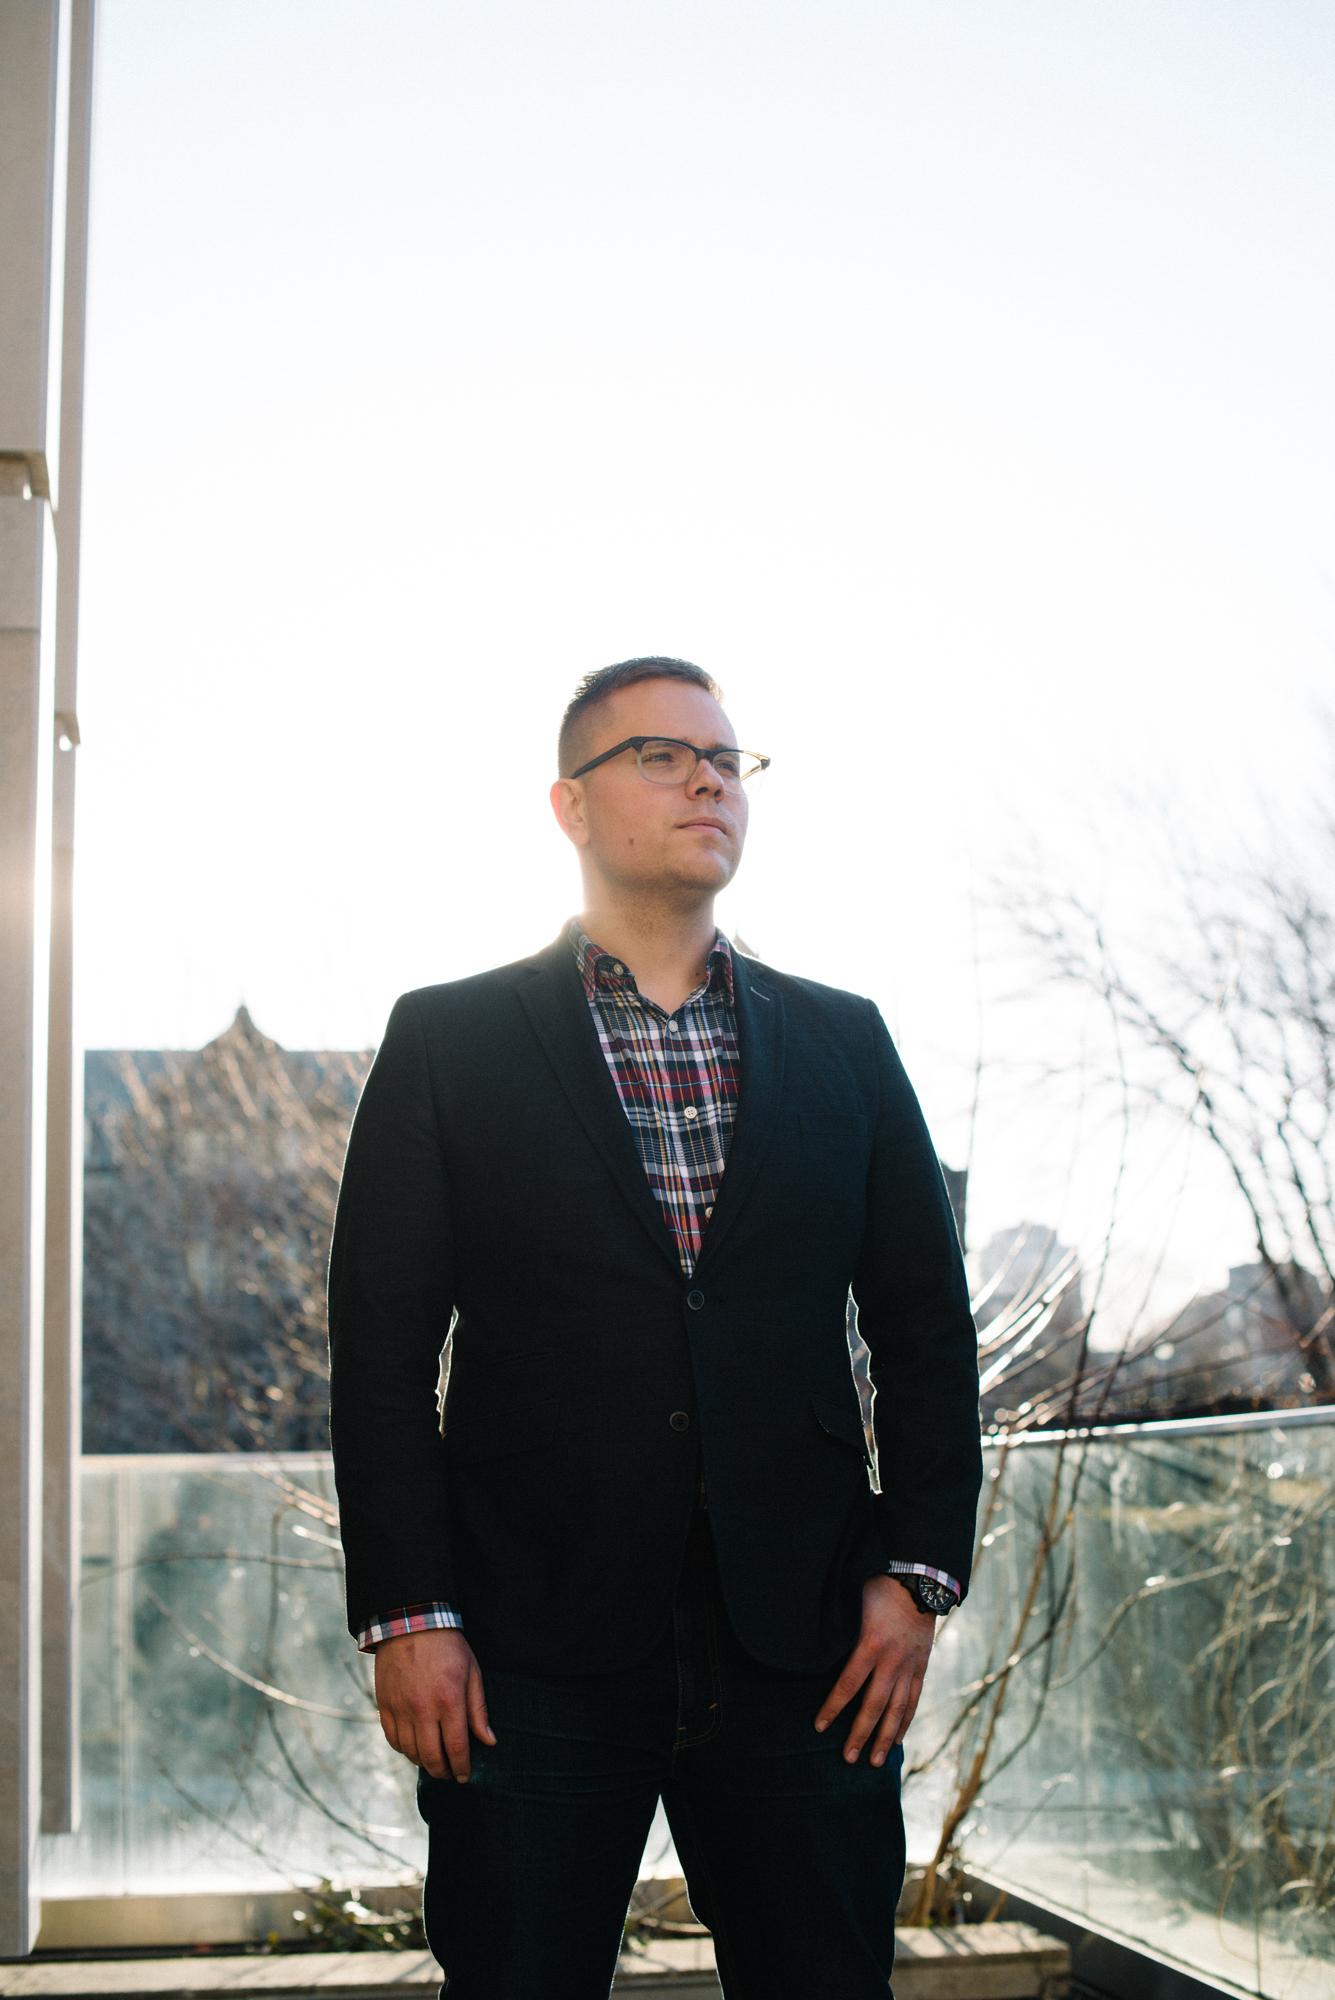 StefEthan-UofT-TRC-TruthandReconciliation-IndigenousIniatives-FacultyofMusic-EliotBirtton-TorontoPortraitPhotographer-1.JPG